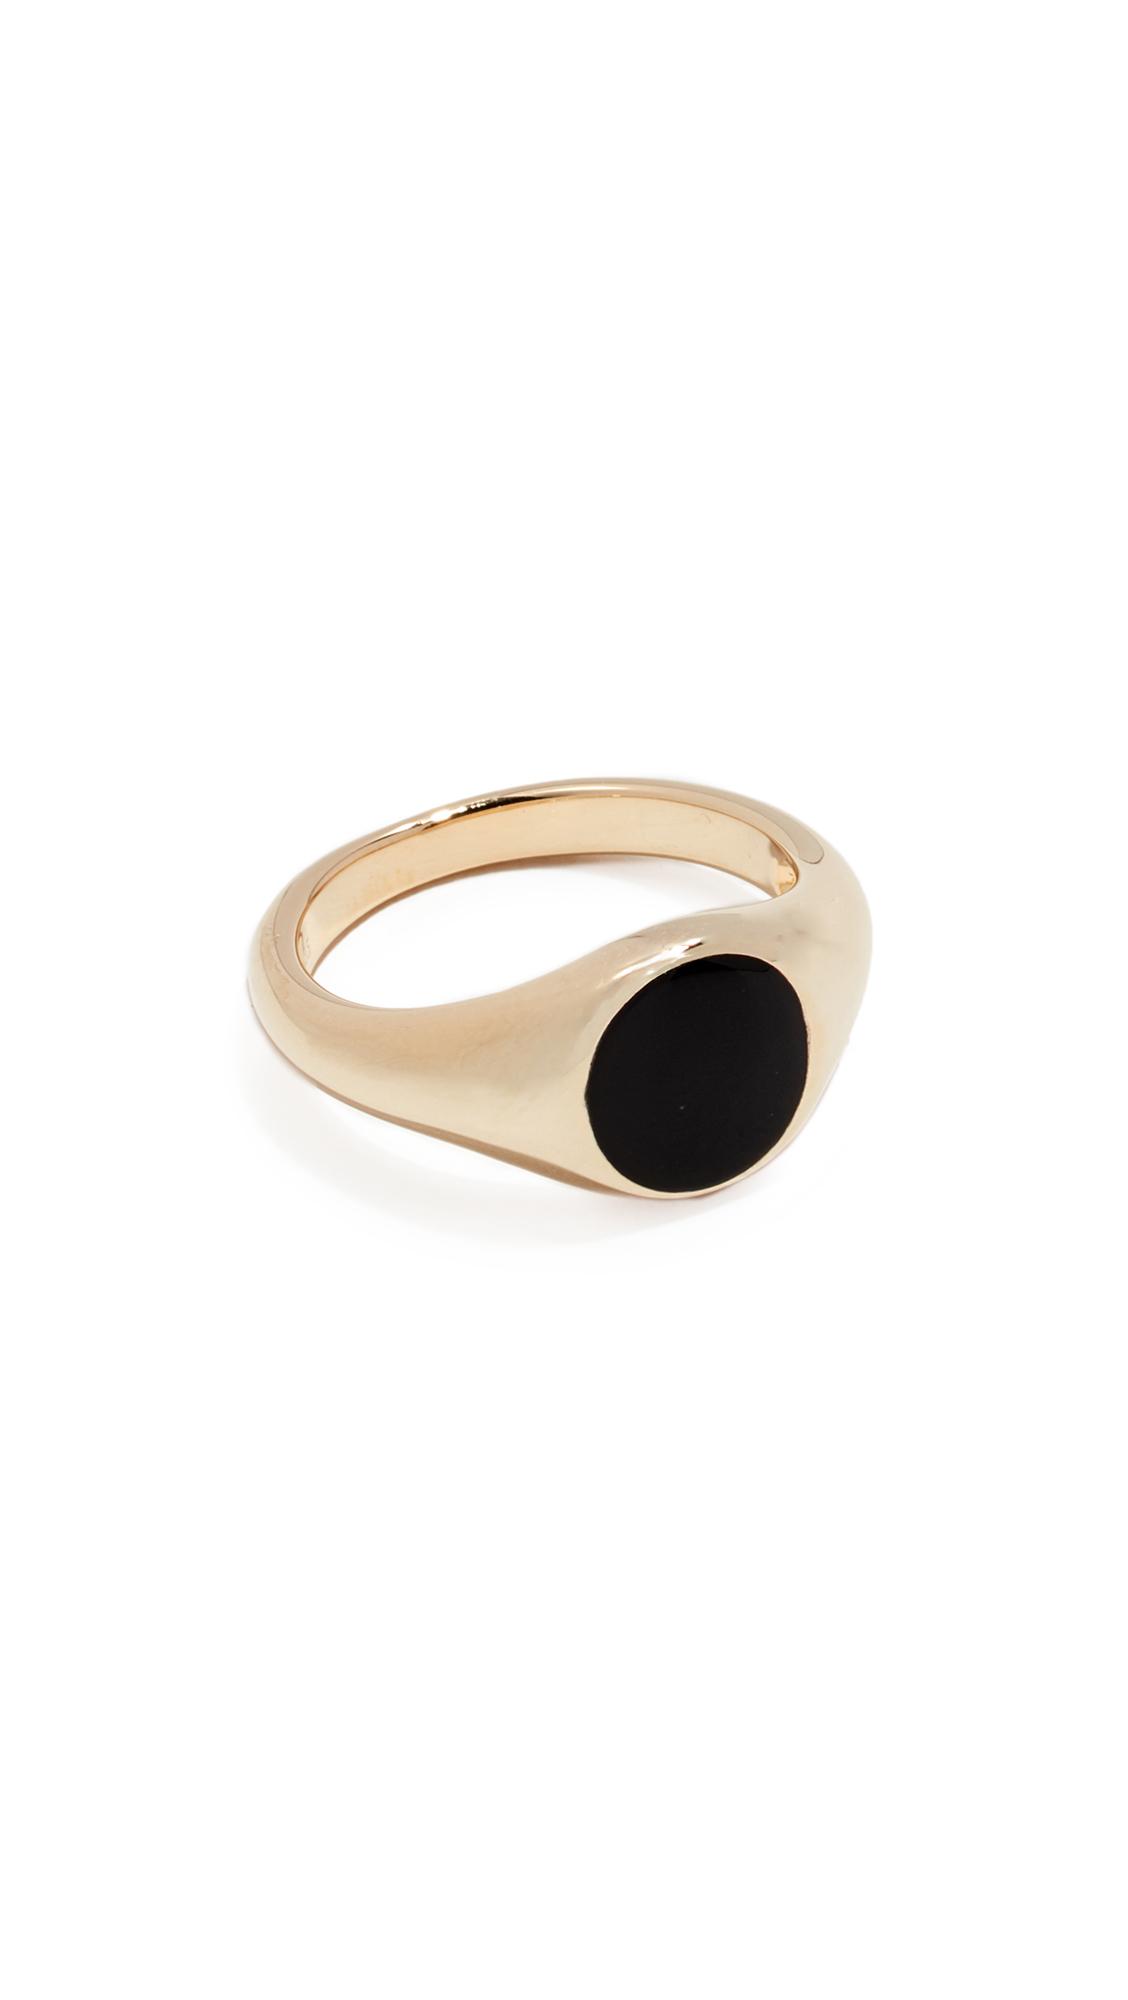 JENNIFER ZEUNER JEWELRY Small Cameron Enamel Ring in Yellow Gold/Black